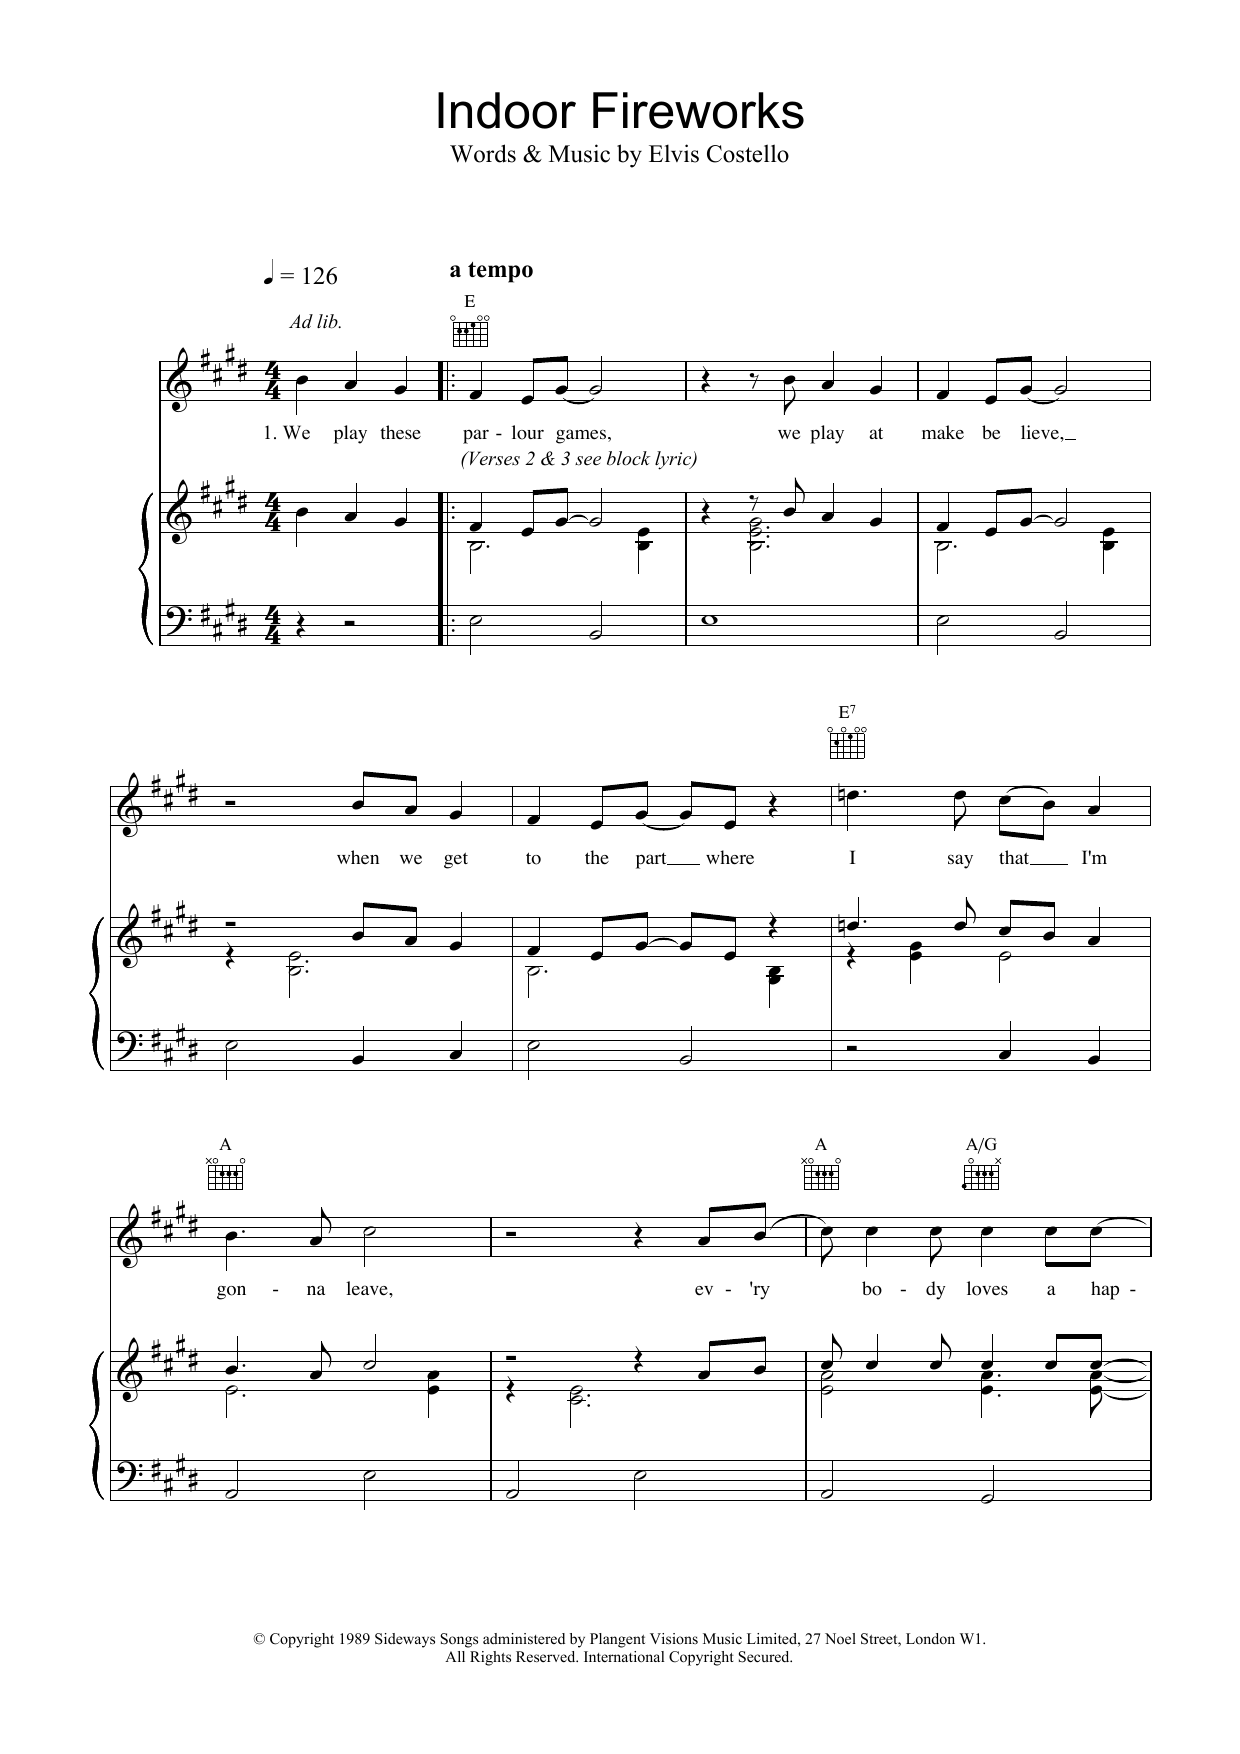 Elvis Costello Indoor Fireworks sheet music notes printable PDF score